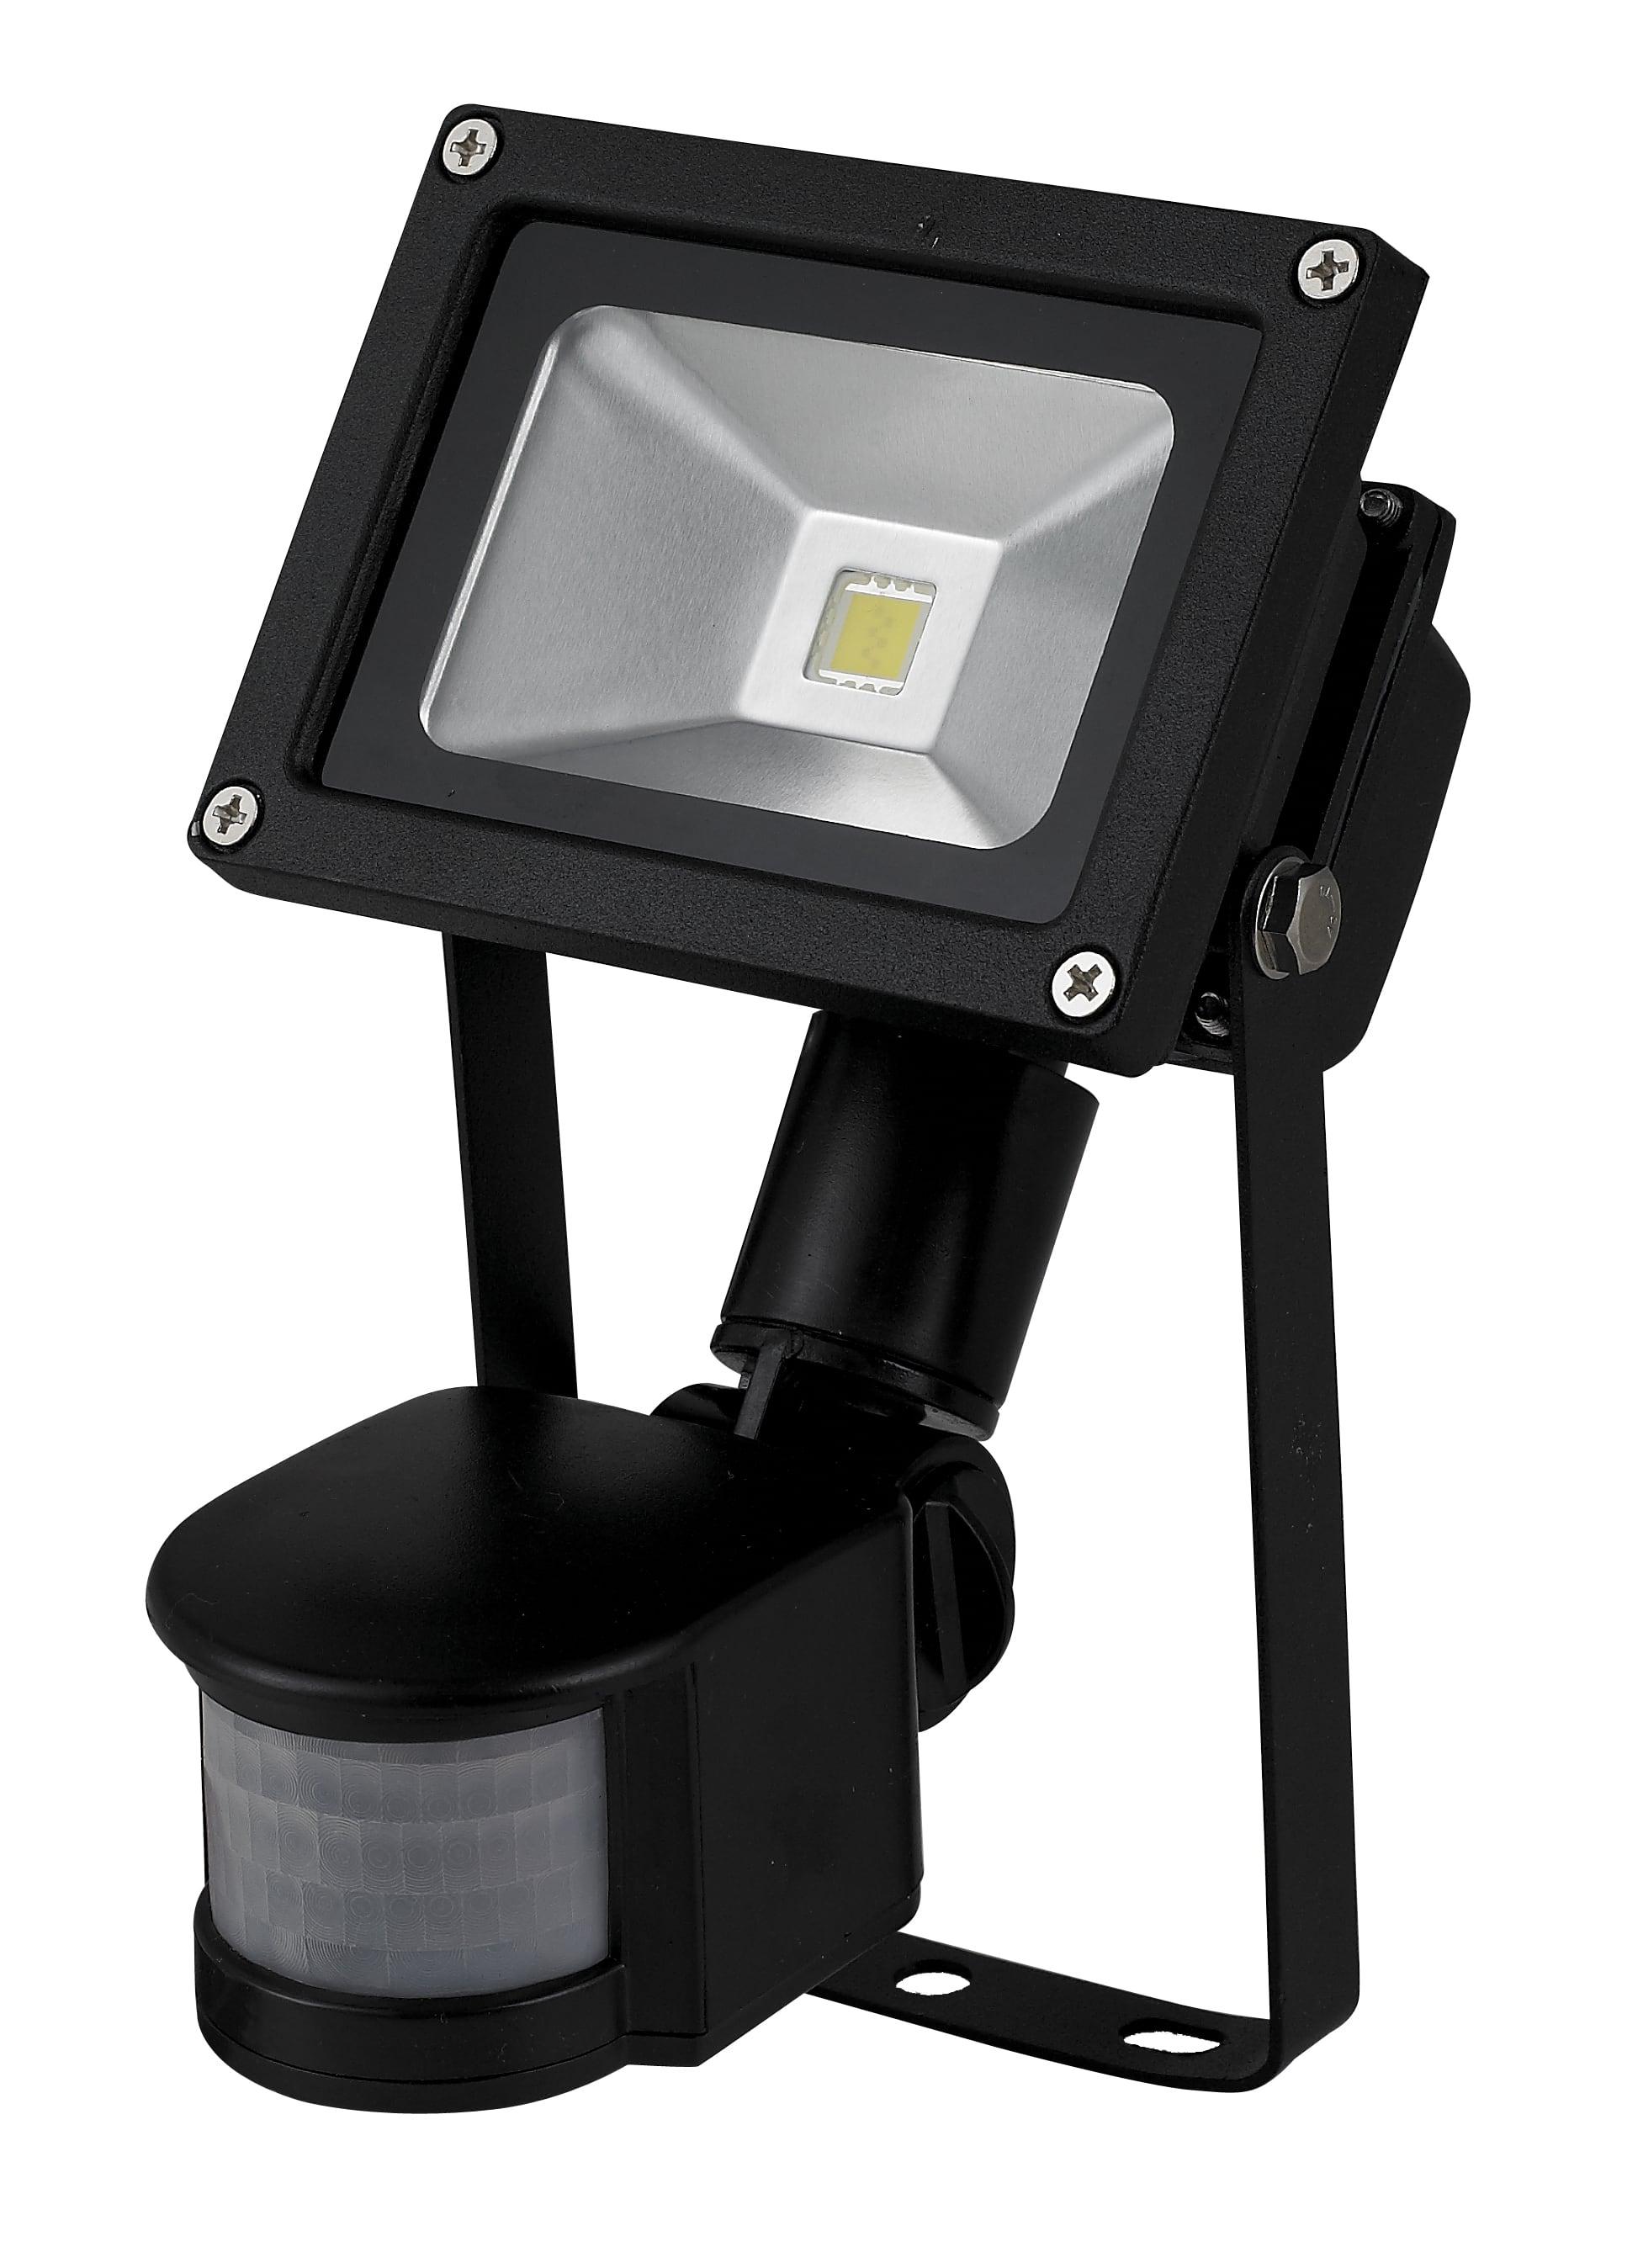 Proiector LED cu senzor de mișcare 20W / 230V 6400K